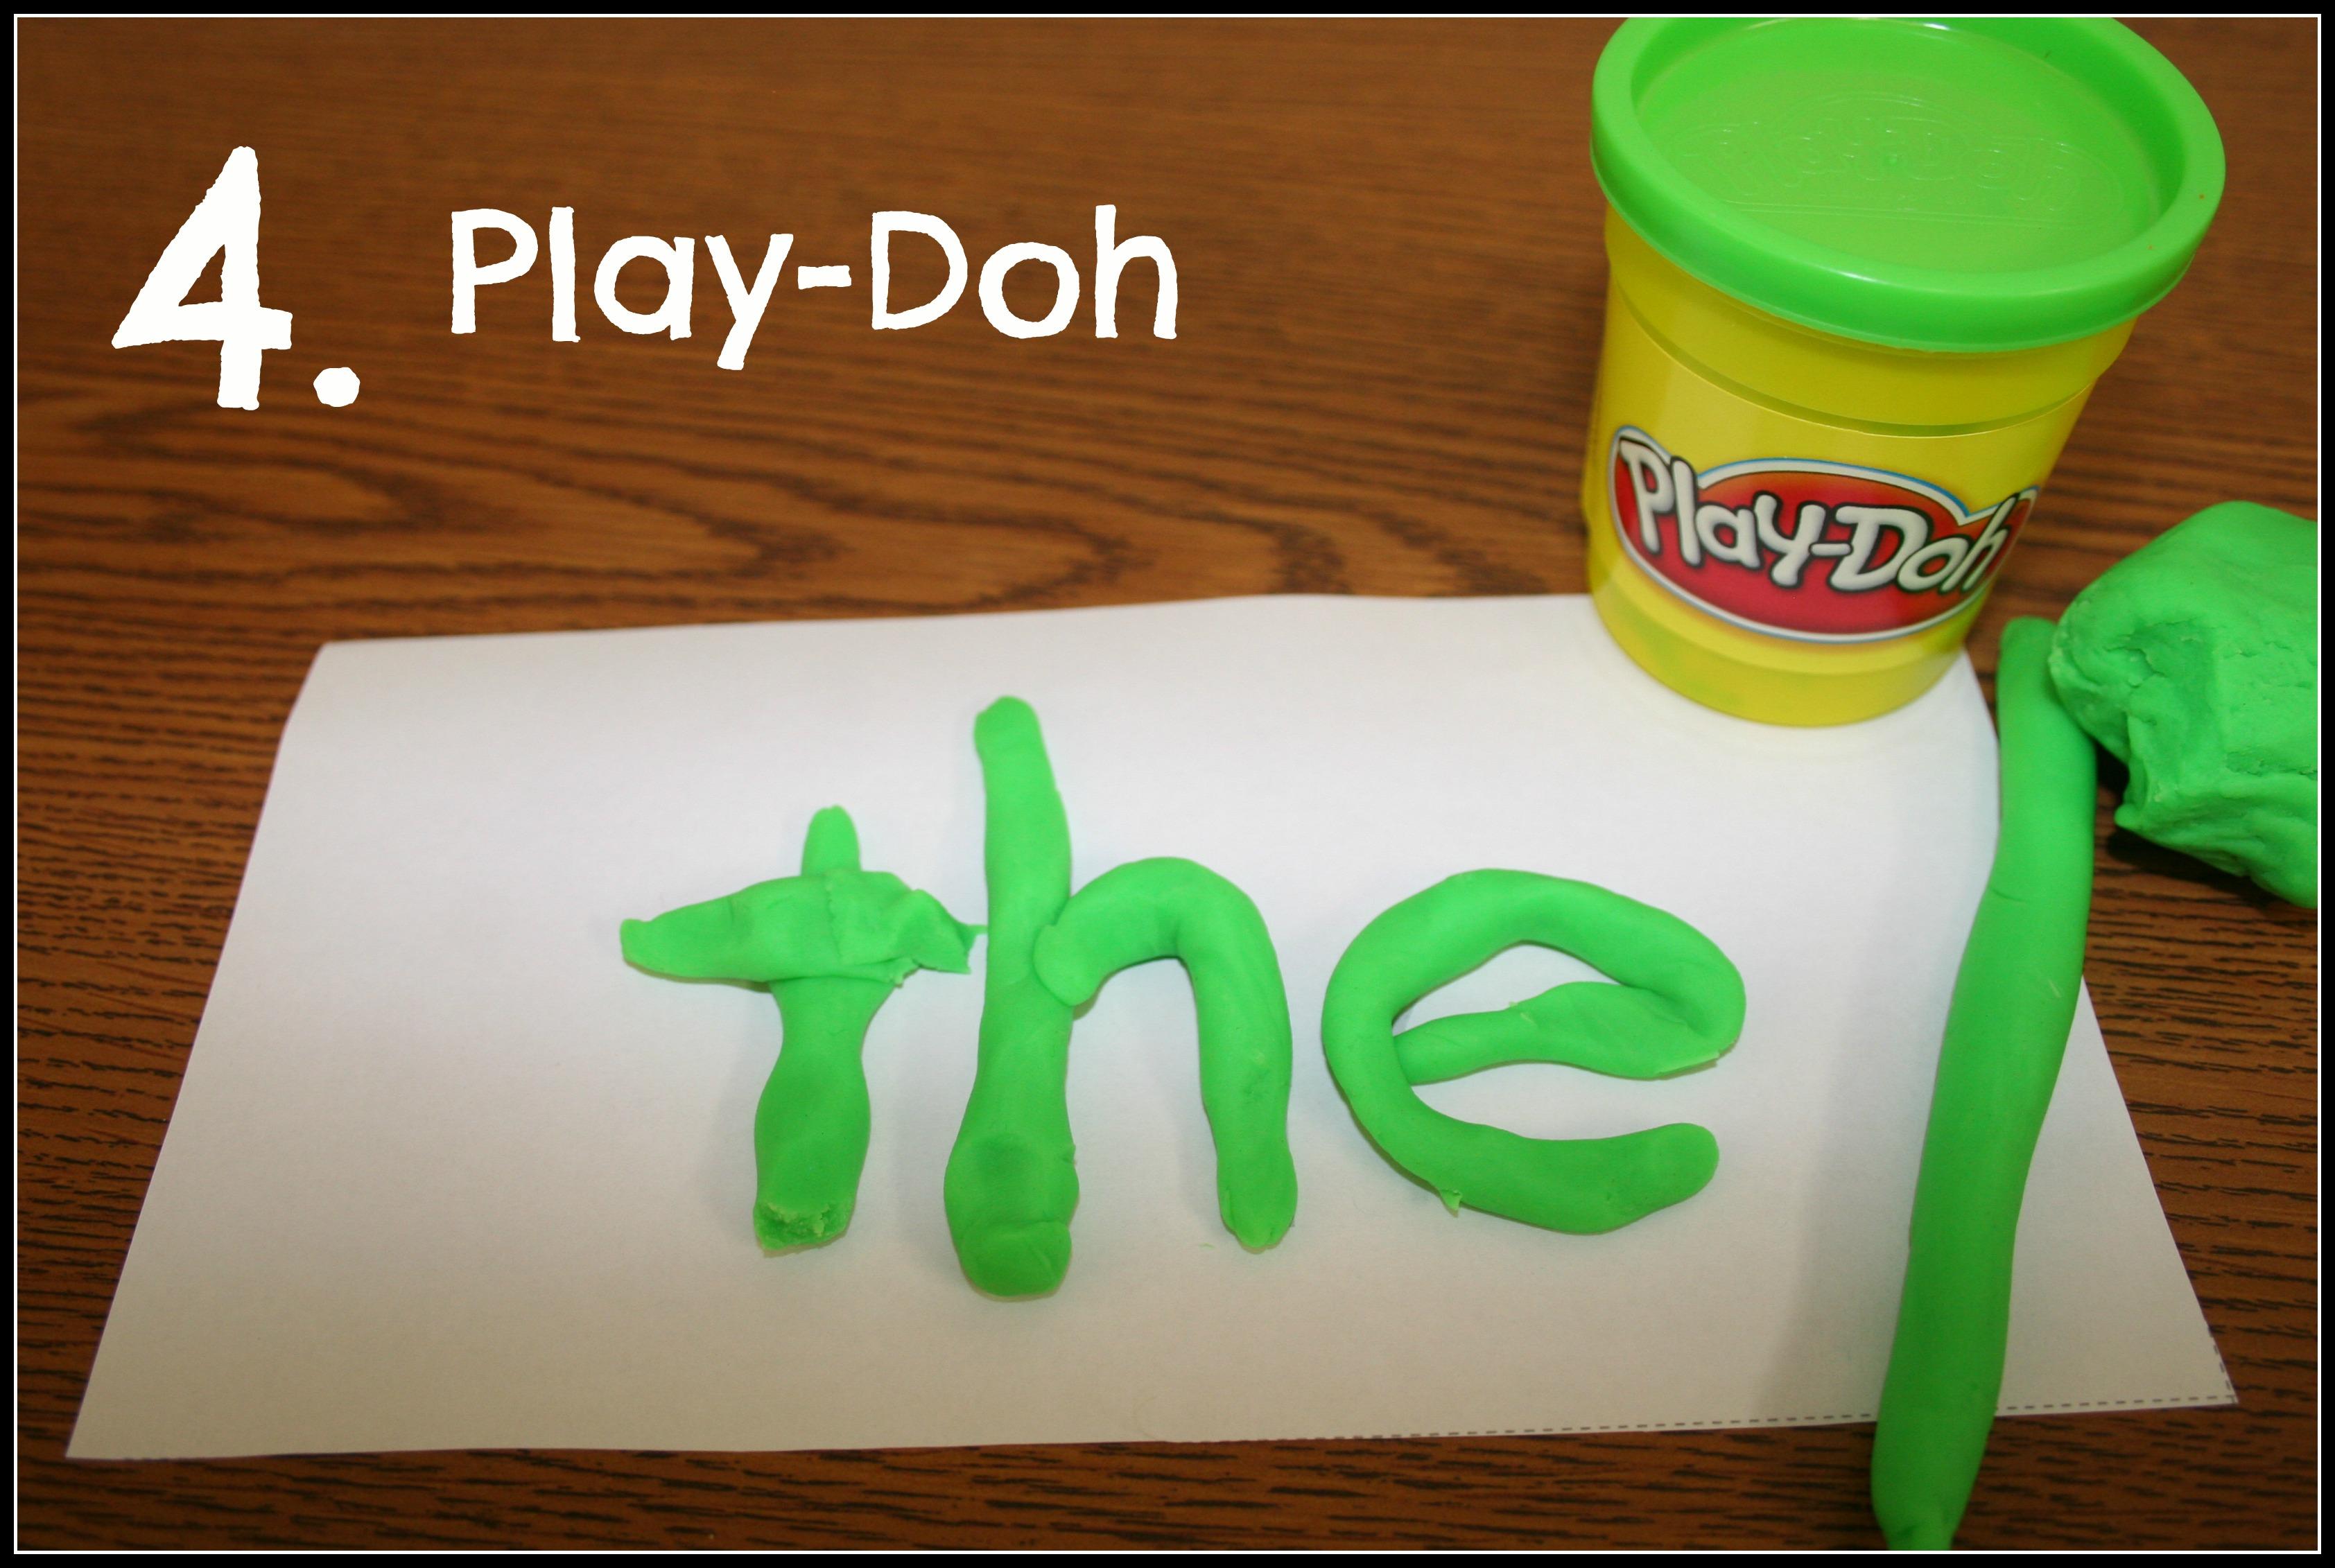 Playdohblogpic